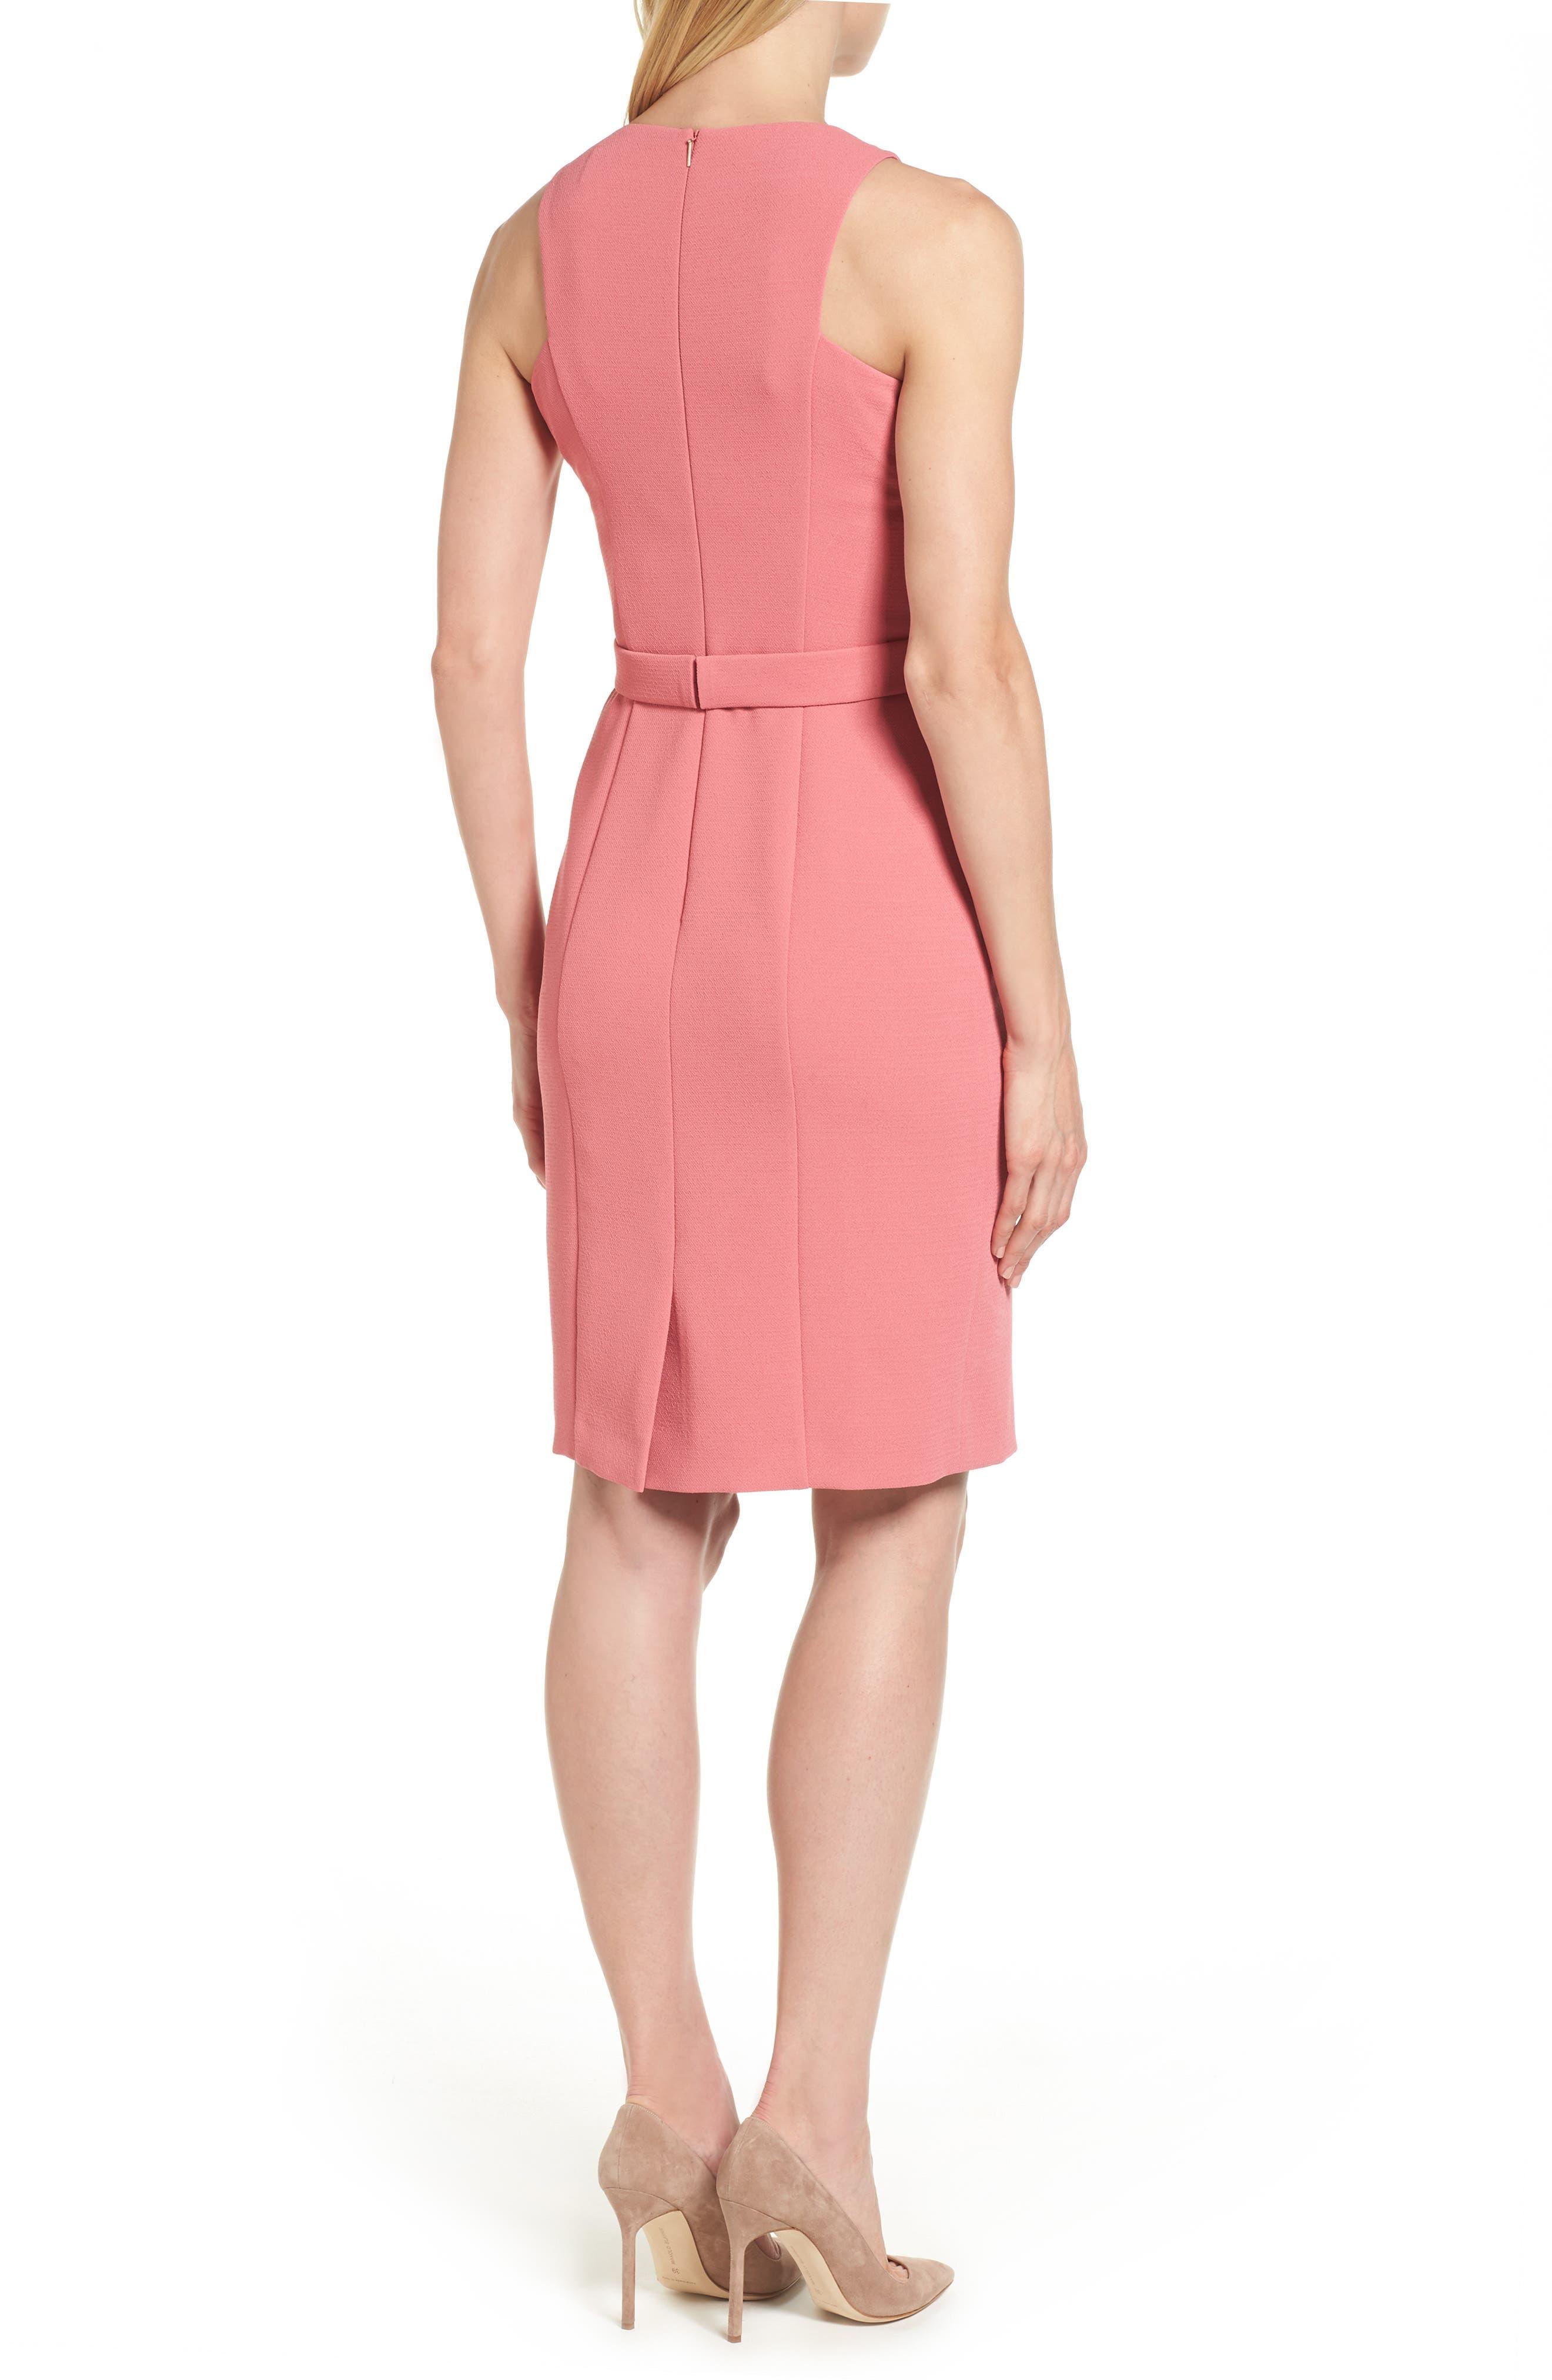 Dalanea Belted Sheath Dress,                             Alternate thumbnail 2, color,